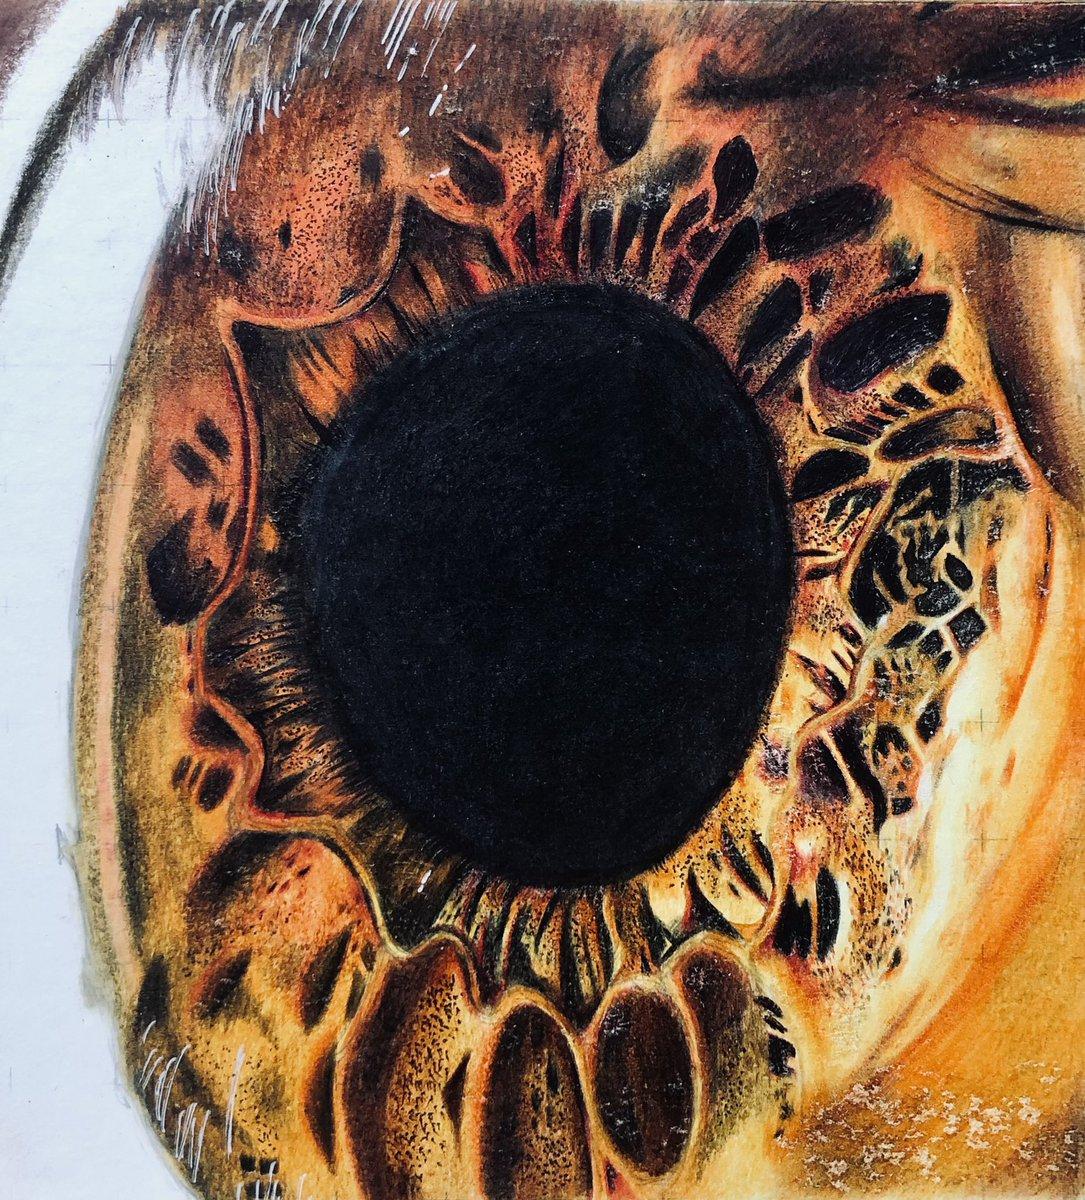 test ツイッターメディア - 色鉛筆で、医療で見た眼球を描きました! 沢山の方に見て頂けたら嬉しいです!!!!!!!!!!!!!!ア゙ア゙ア゙ア゙ア゙ ※閲覧注意です🙇♀️💦🙏  #色鉛筆画 #眼球 https://t.co/2p43fKWsFb